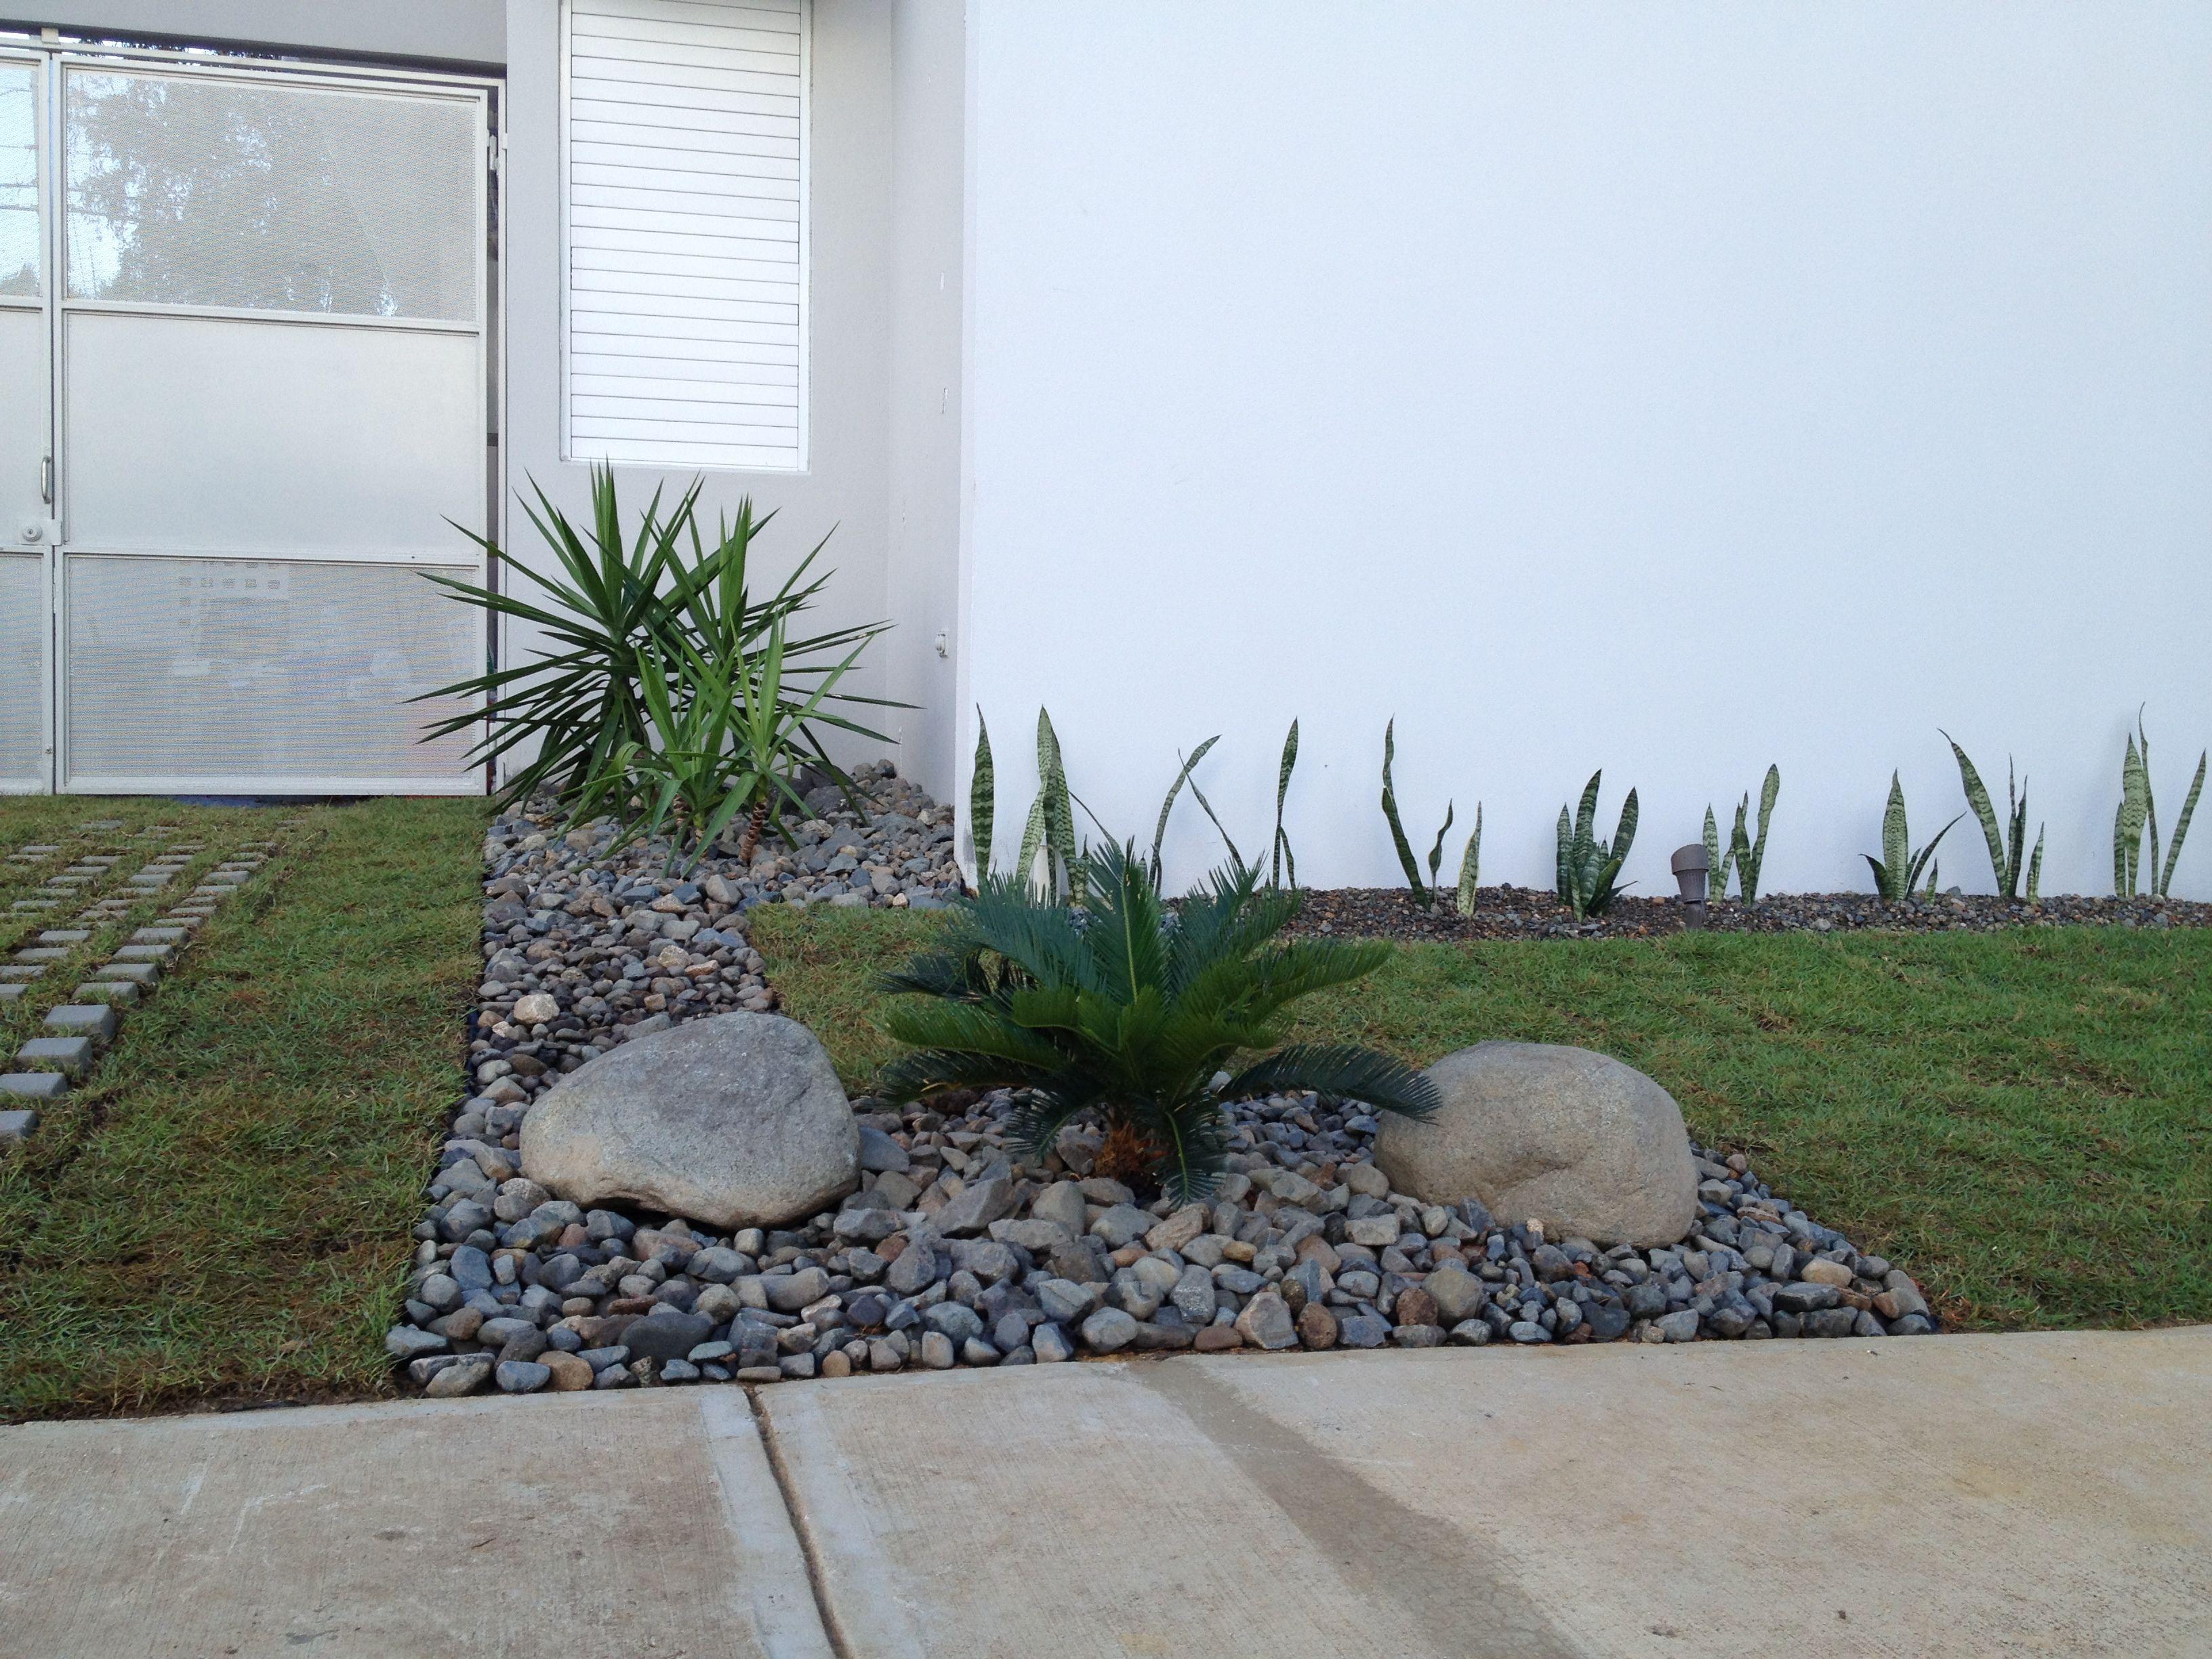 Jardin moderno garden irrigation pr en facebook garden for Ideas para mi jardin